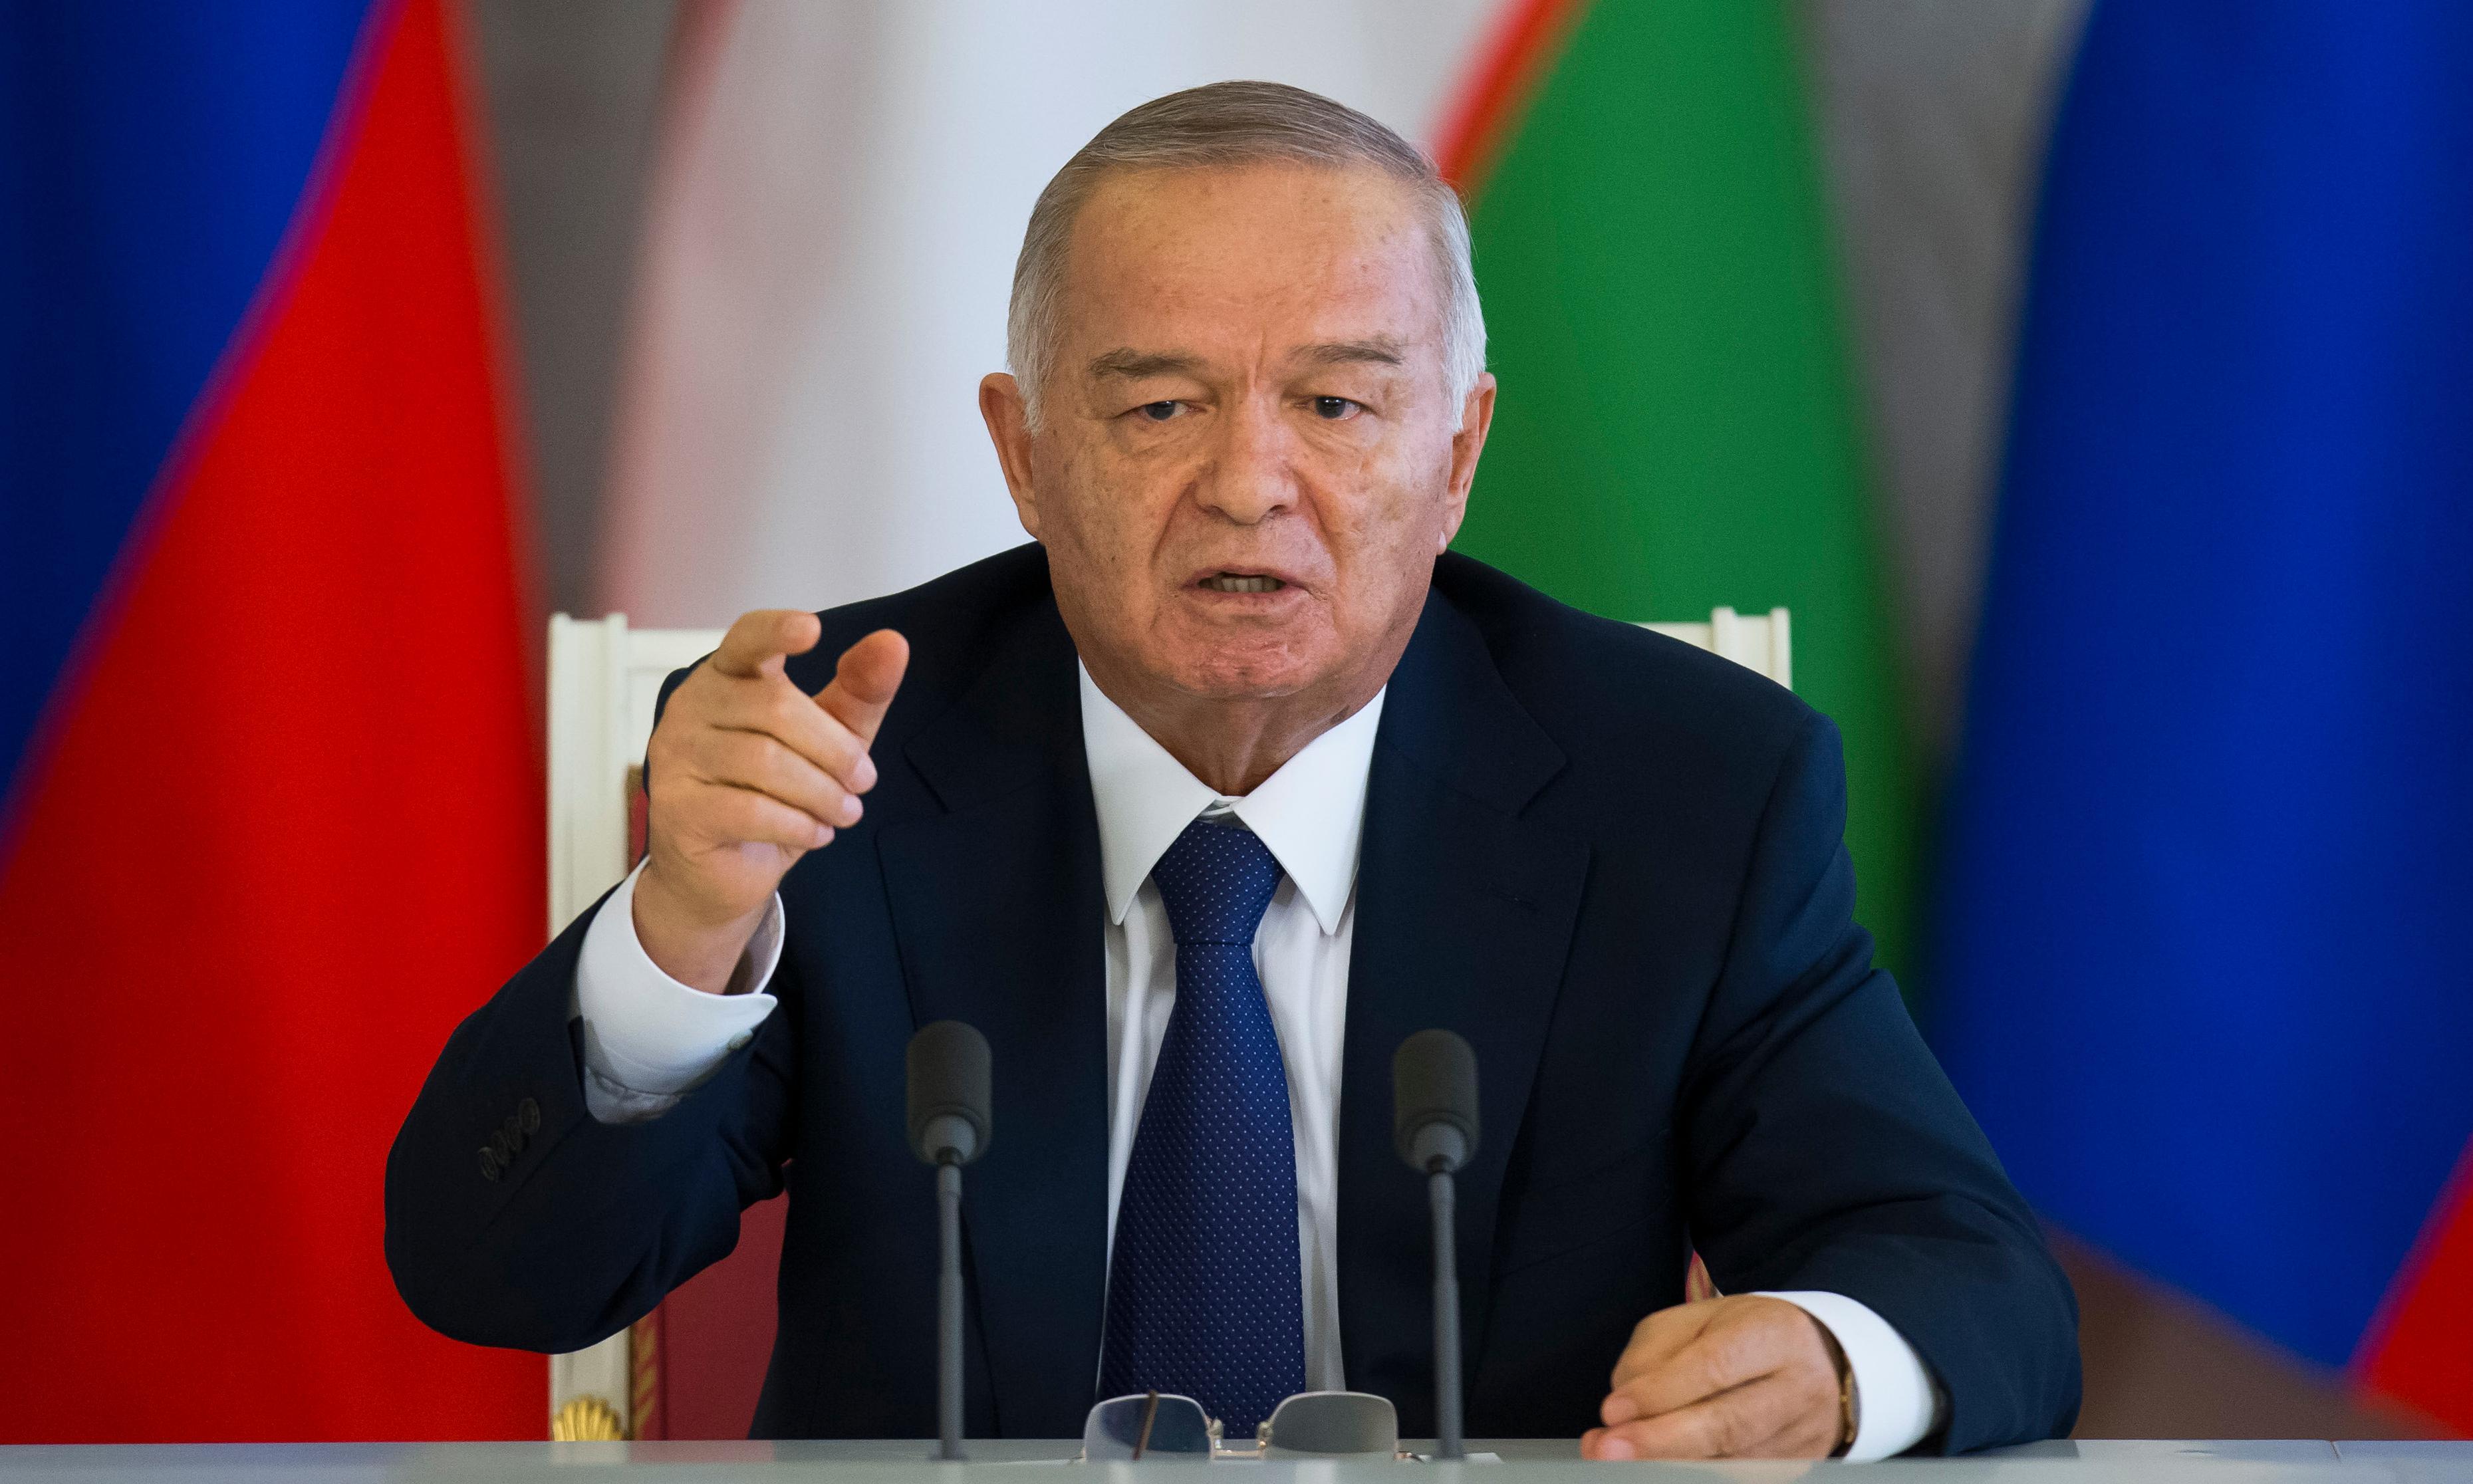 Gulnara Karimova: new details emerge in story of Uzbekistan's first daughter